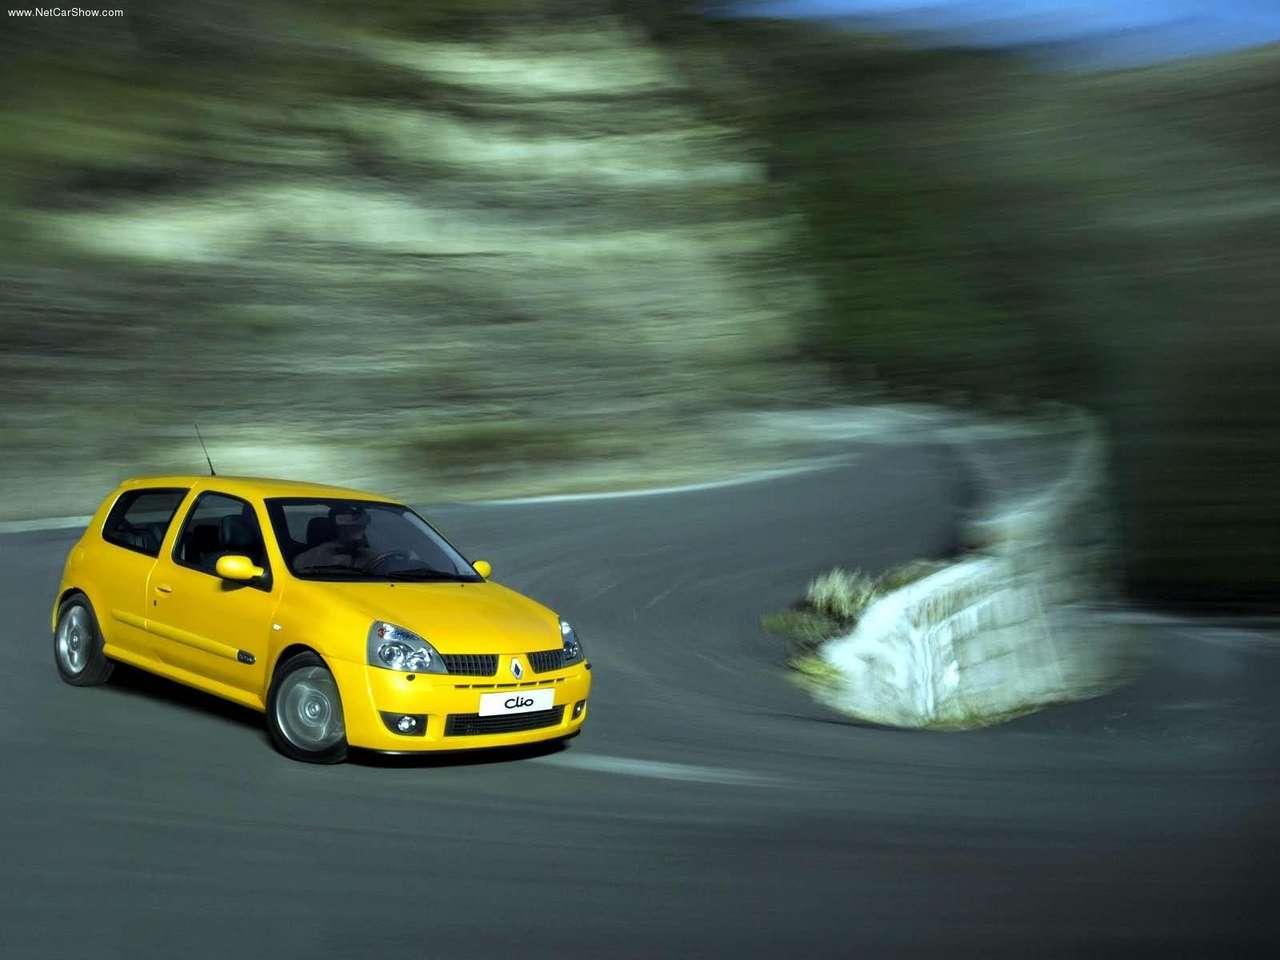 Renault Clio Renaultsport, Renault Clio, Renault, Clio, Renaultsport, Clio 182, 182, hot hatch, track car, motoring, automotive, car, cars, French car, hot hatch, track day, sport car, motoring, automotiive, ebay, ebay motors, autotrader